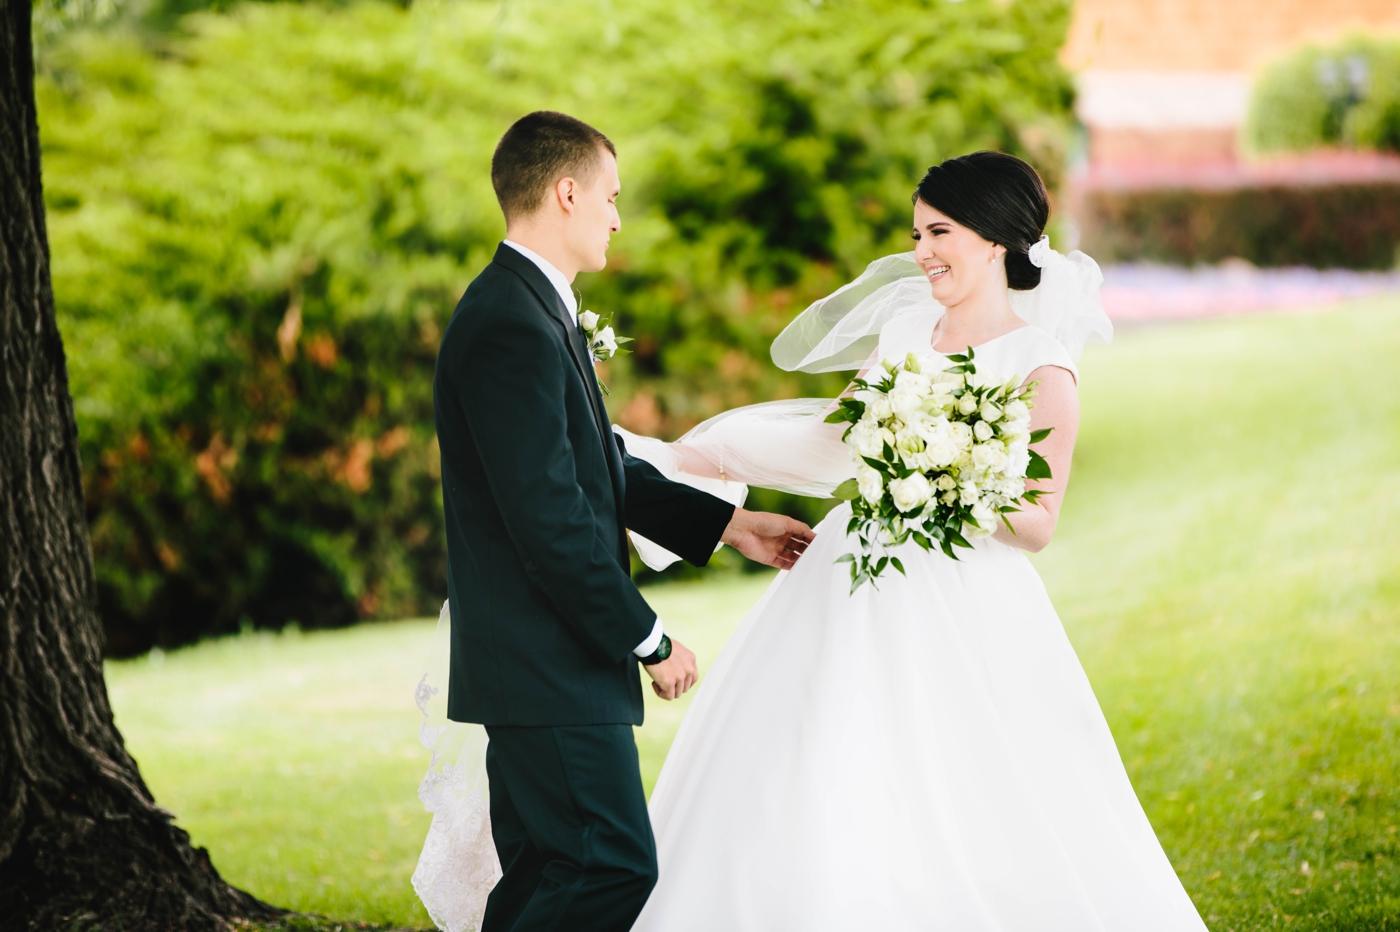 chicago-fine-art-wedding-photography-mccarthy22